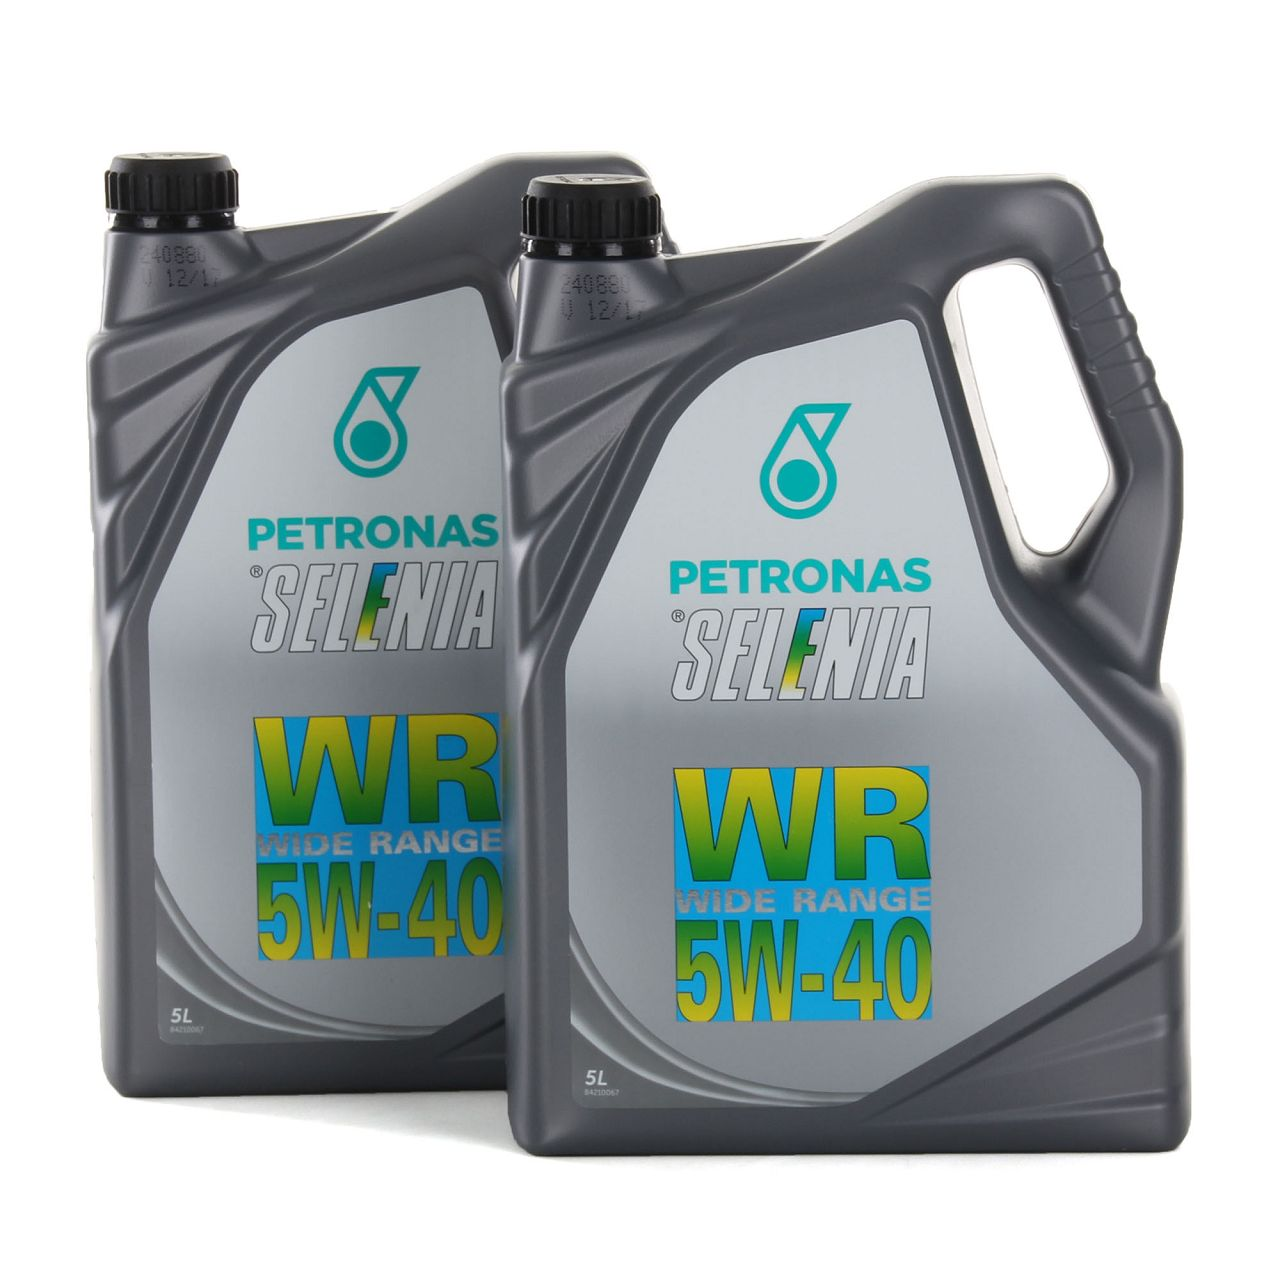 PETRONAS SELENIA Motoröl Öl WR WIDE RANGE 5W40 5W-40 Fiat 9.55535-S3 - 10 Liter